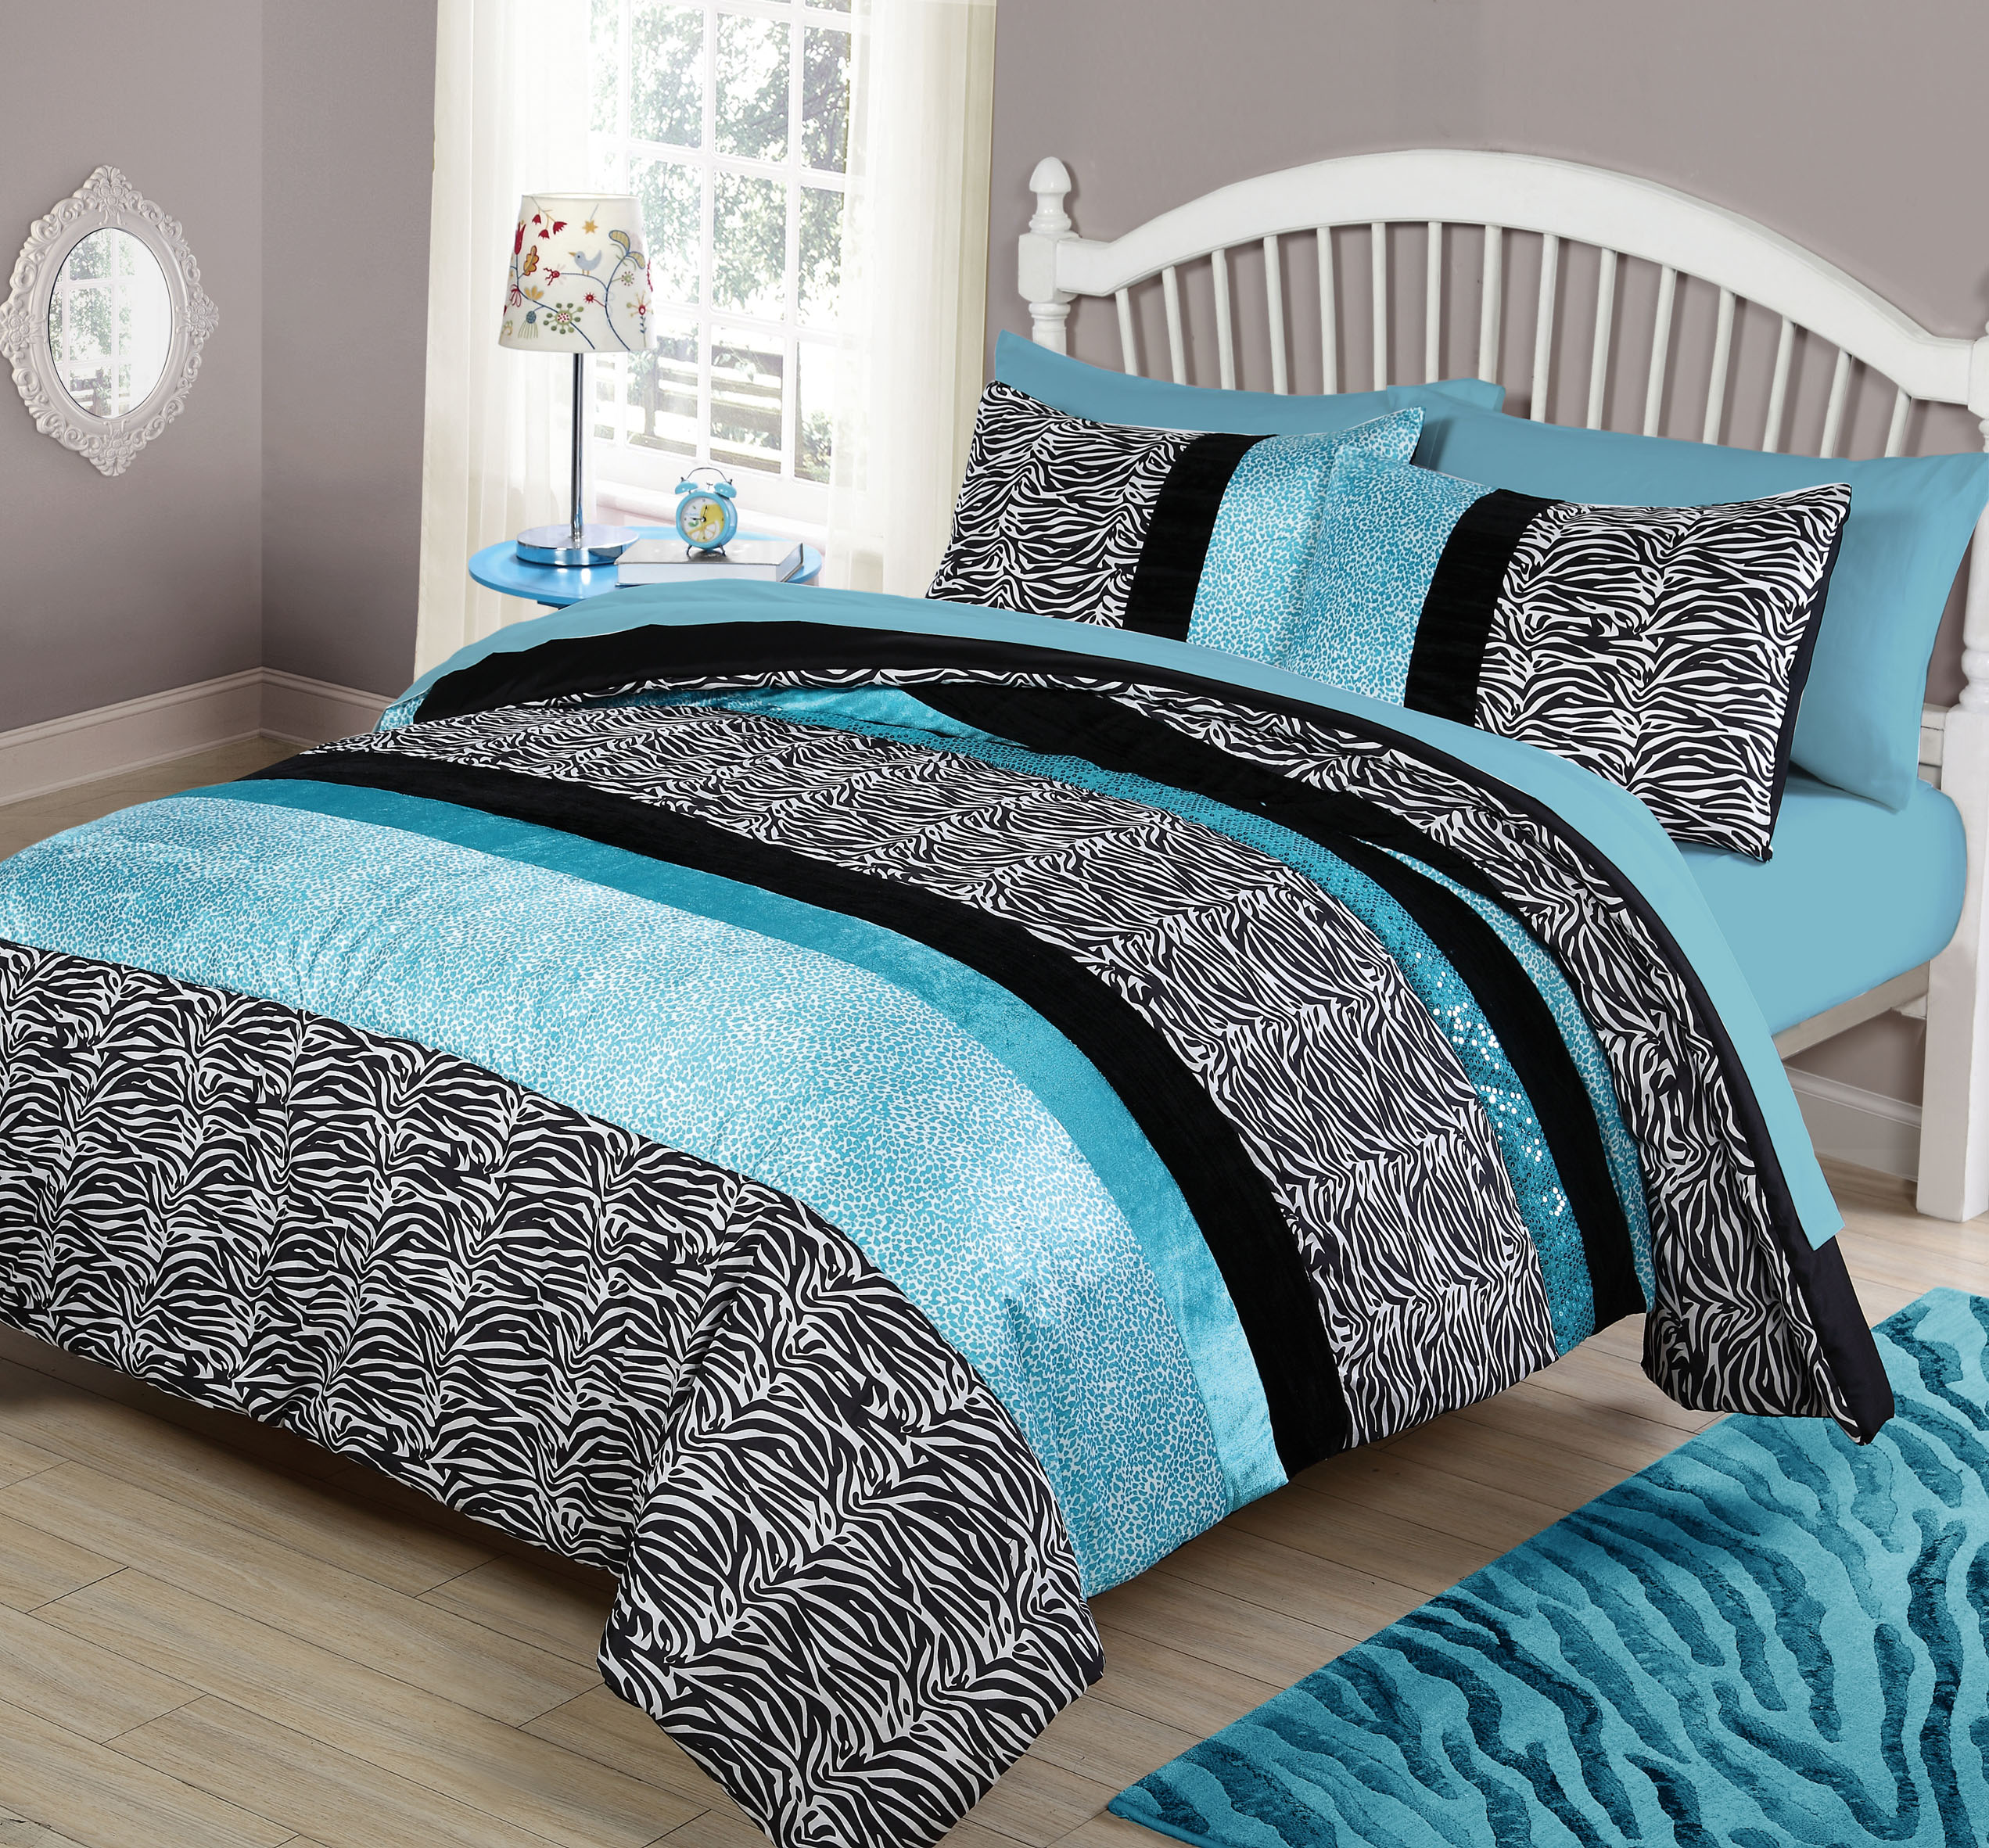 Your Zone Zebra Bedding Comforter Set, 1 Each